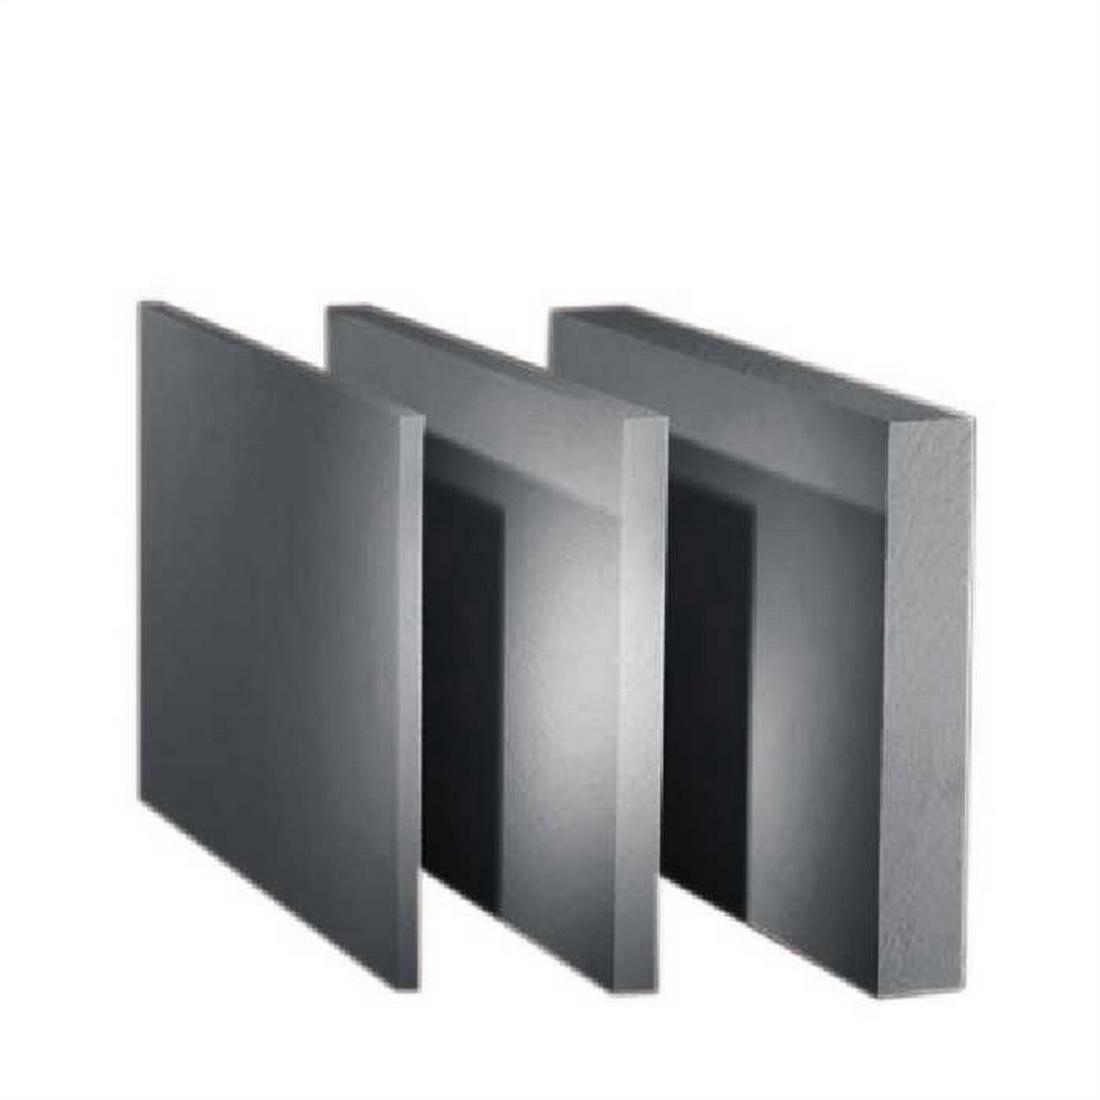 Expol Platinum Board 2400 x 1200 x 70mm R2.19 Black Expanded Polystyrene N2470